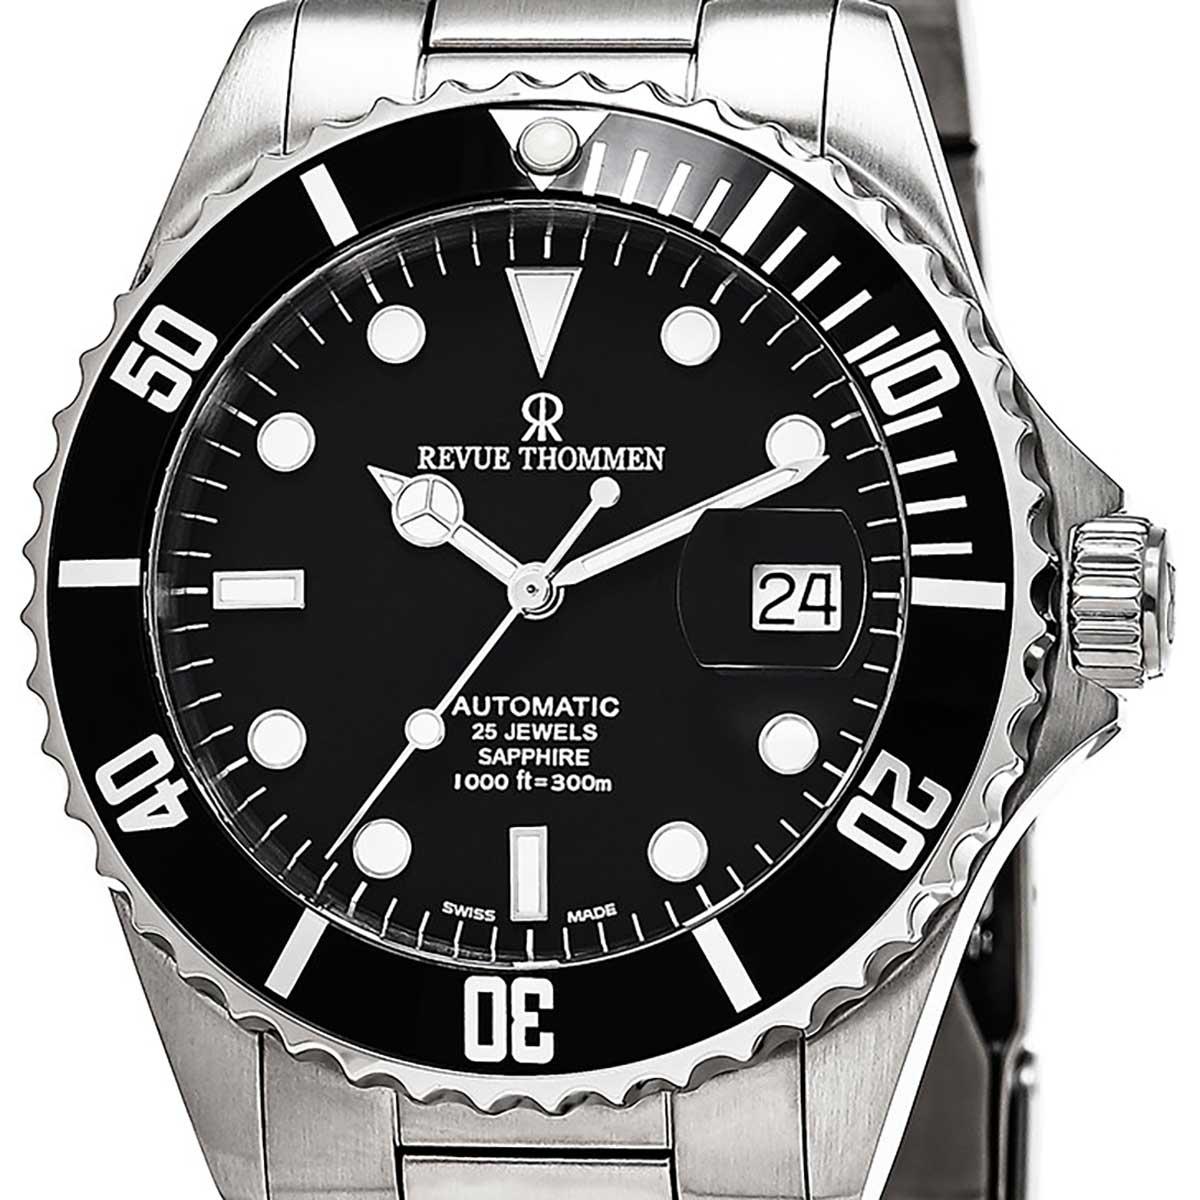 REVUE THOMMEN レビュートーメン 自動巻き(手巻き機能あり) 腕時計 [17571.2137] 並行輸入品 ブラック(黒)